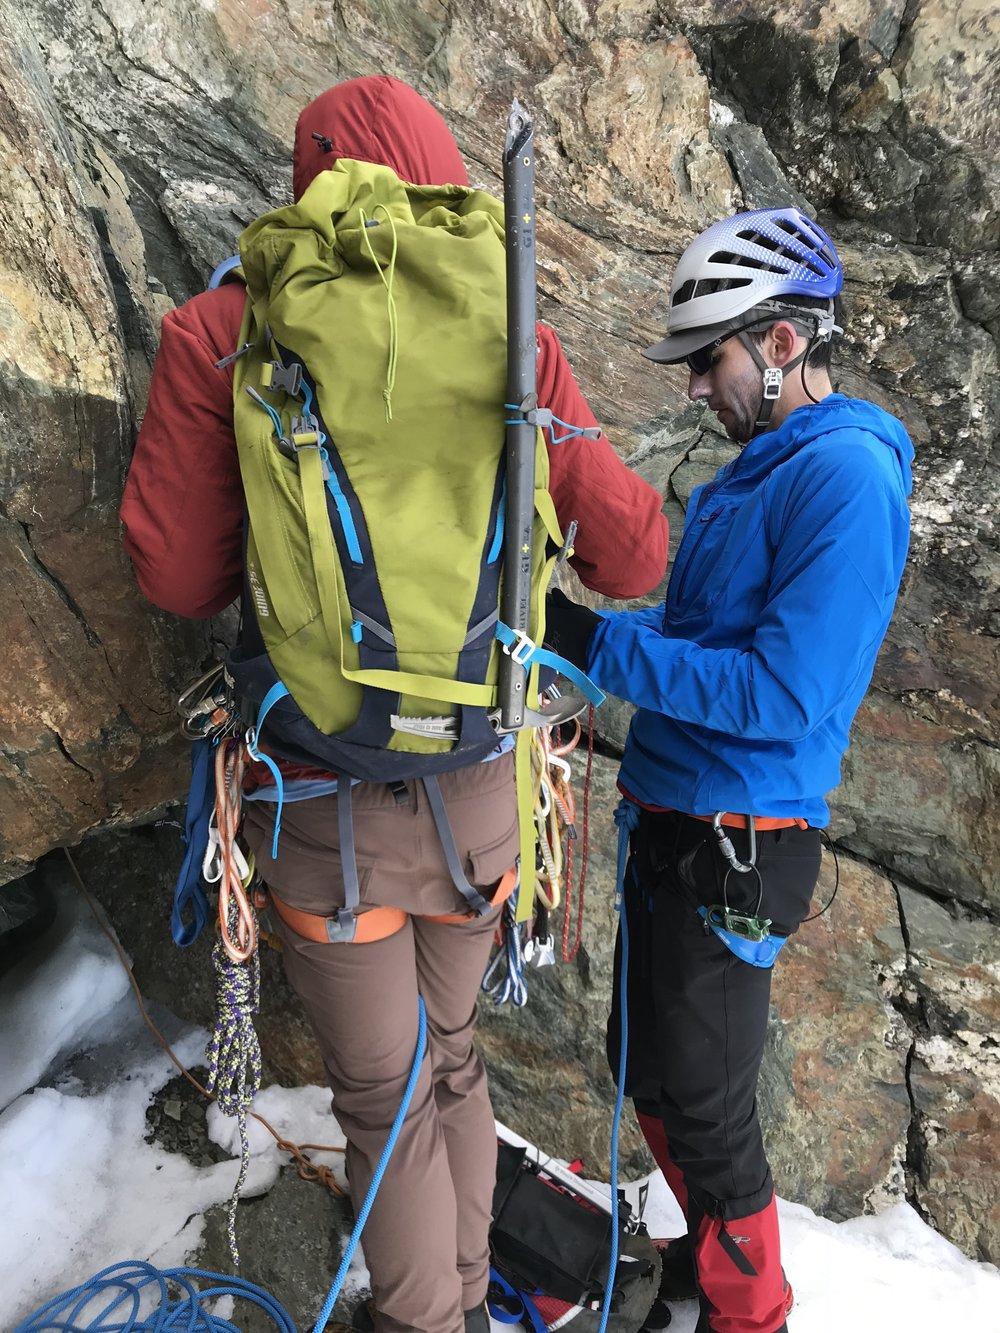 preparing to simul-climb, getting cold - Base of Mt. Shuksan summit pyramid, WA